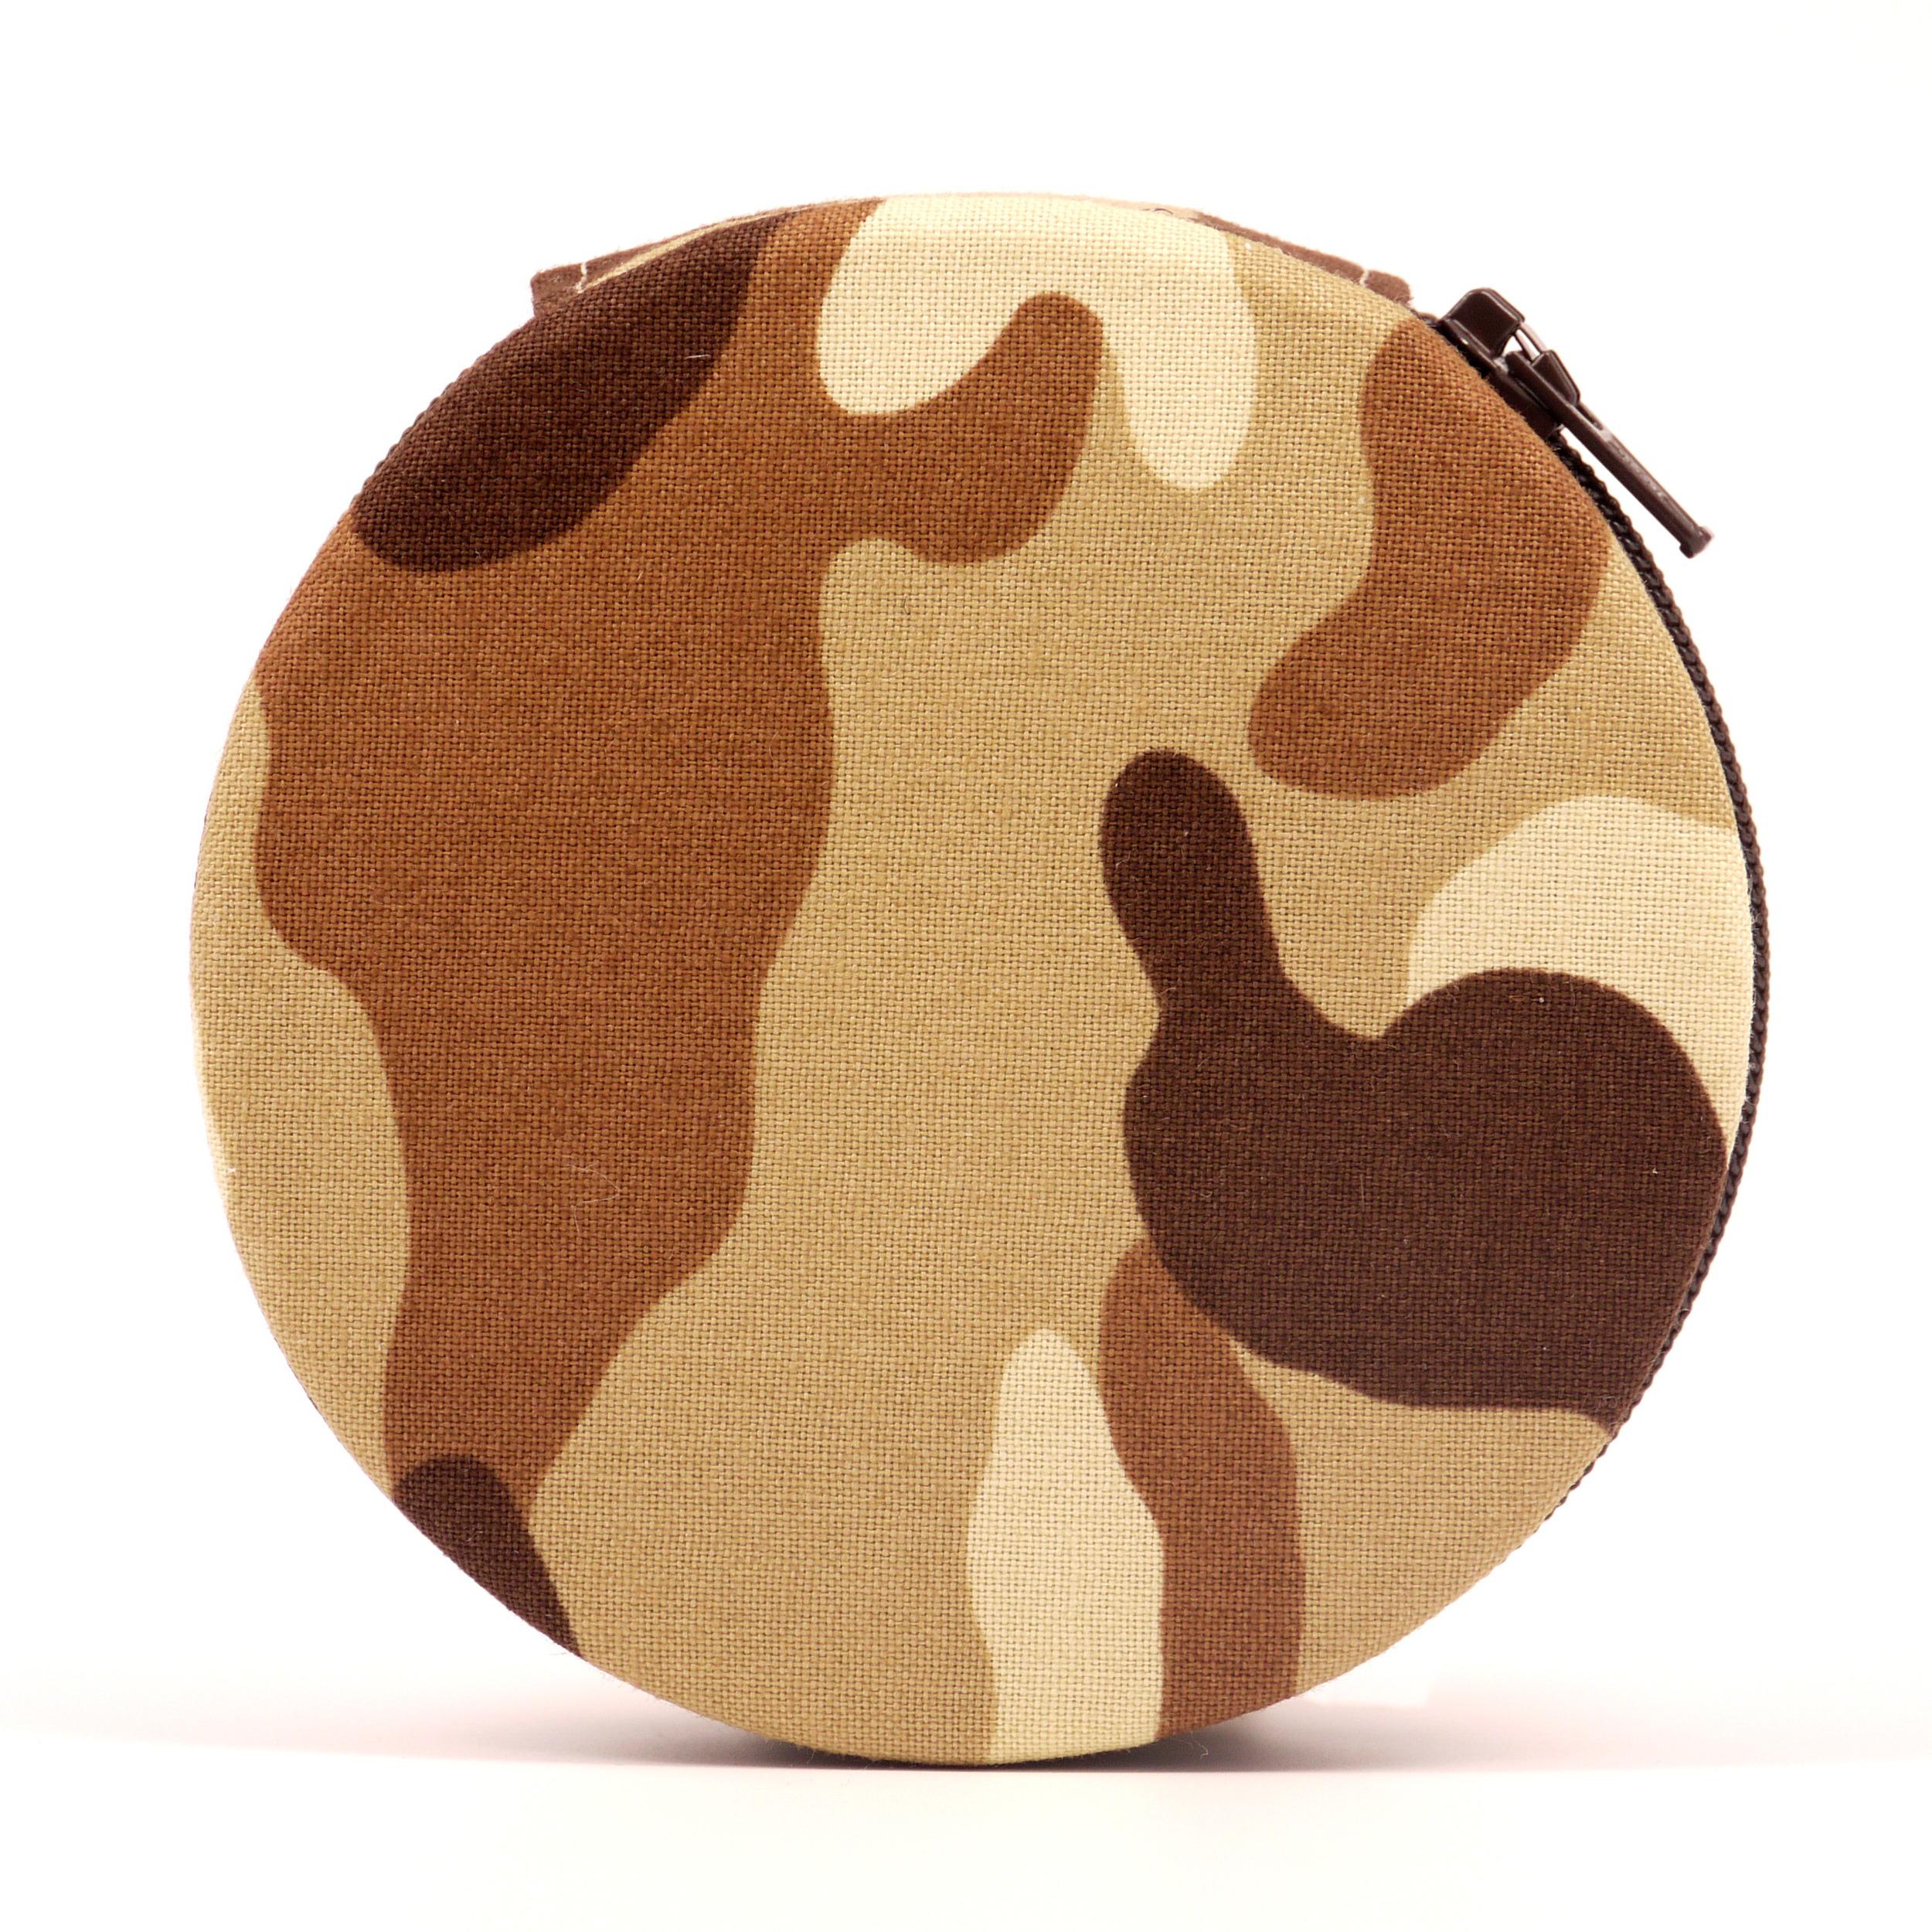 Camouflage Printed Pill Organizer